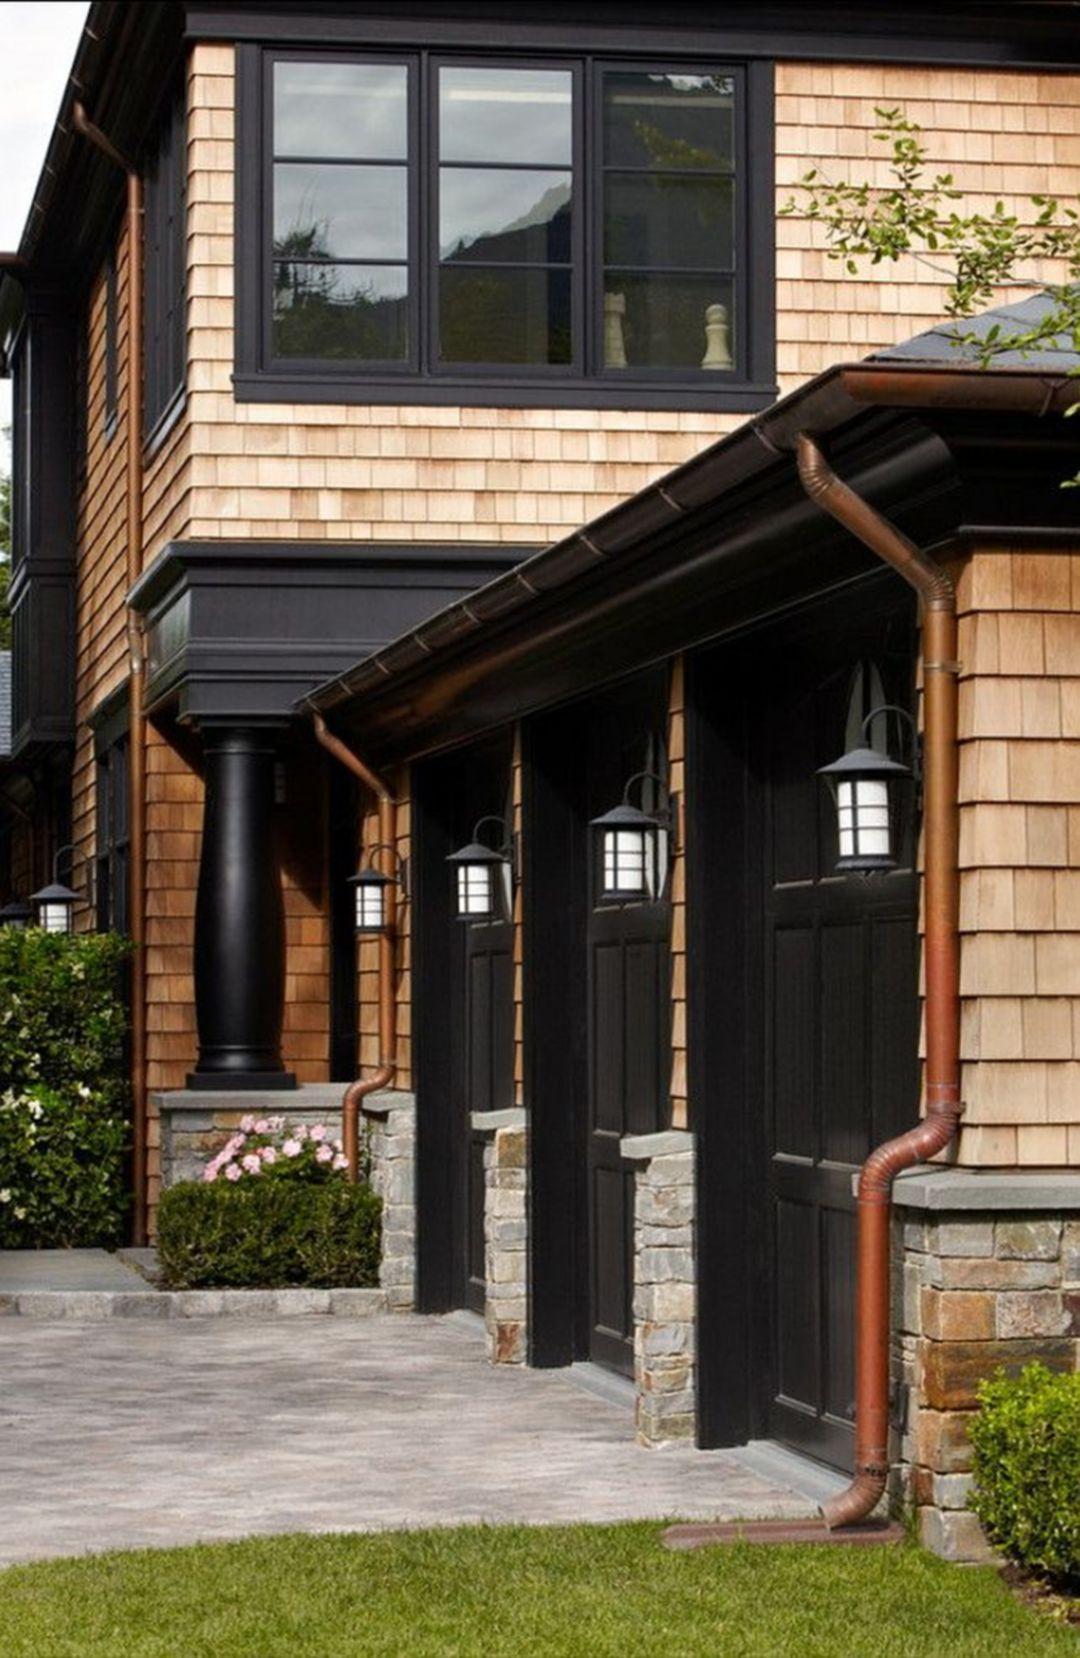 Gorgeous 10 Black House Exterior Ideas To Make Your House Looks More Awesome Black House Exterior Shingle House Cedar Homes